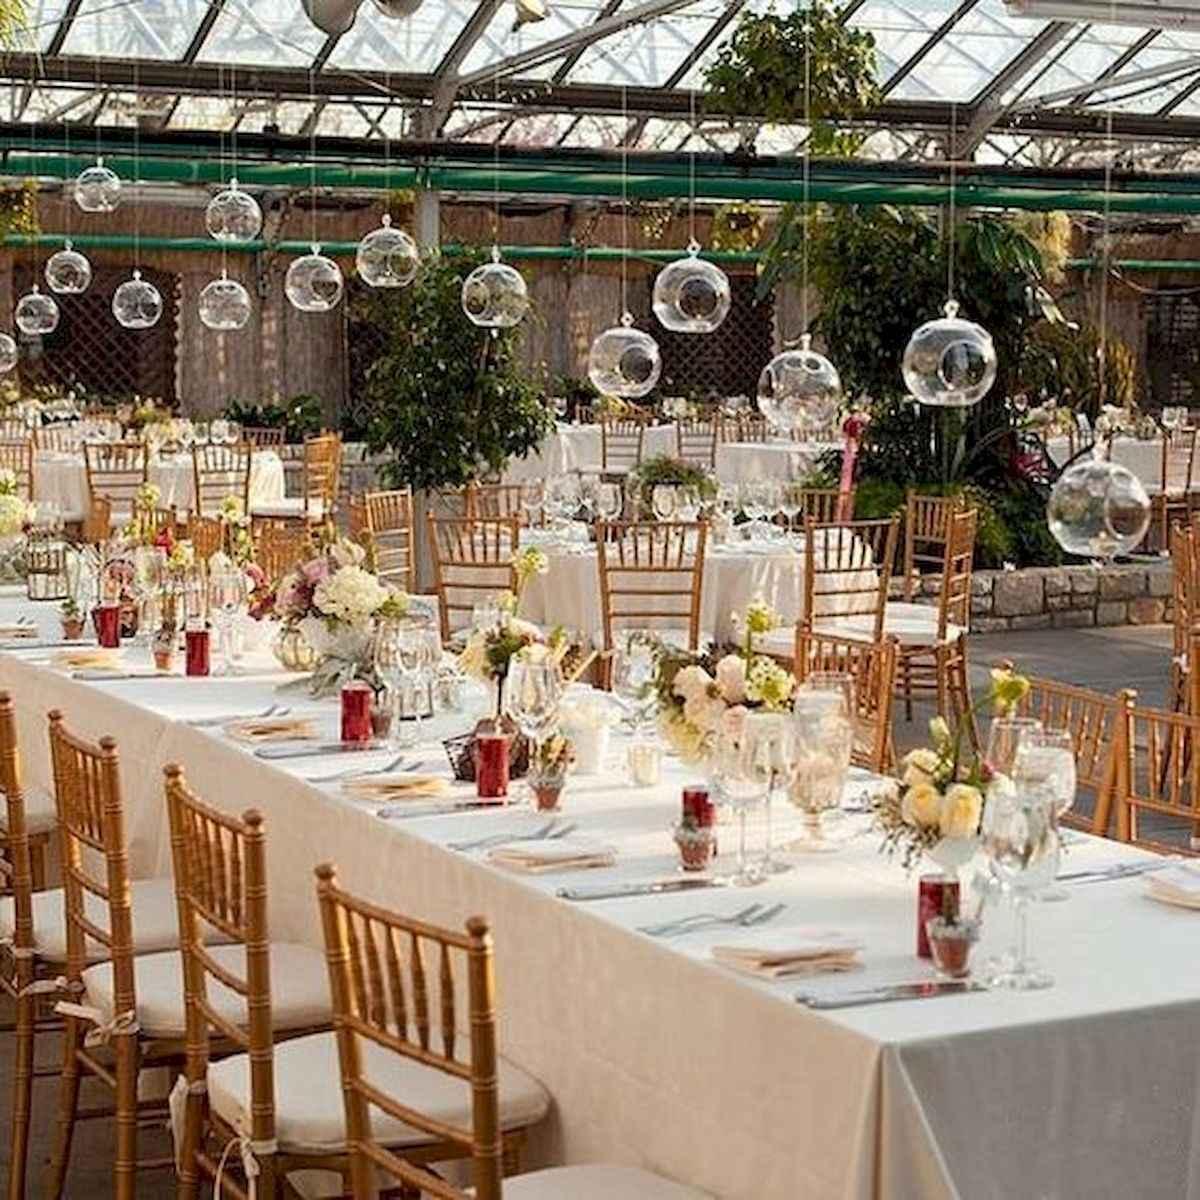 40 awesome backyard wedding decor ideas (25)